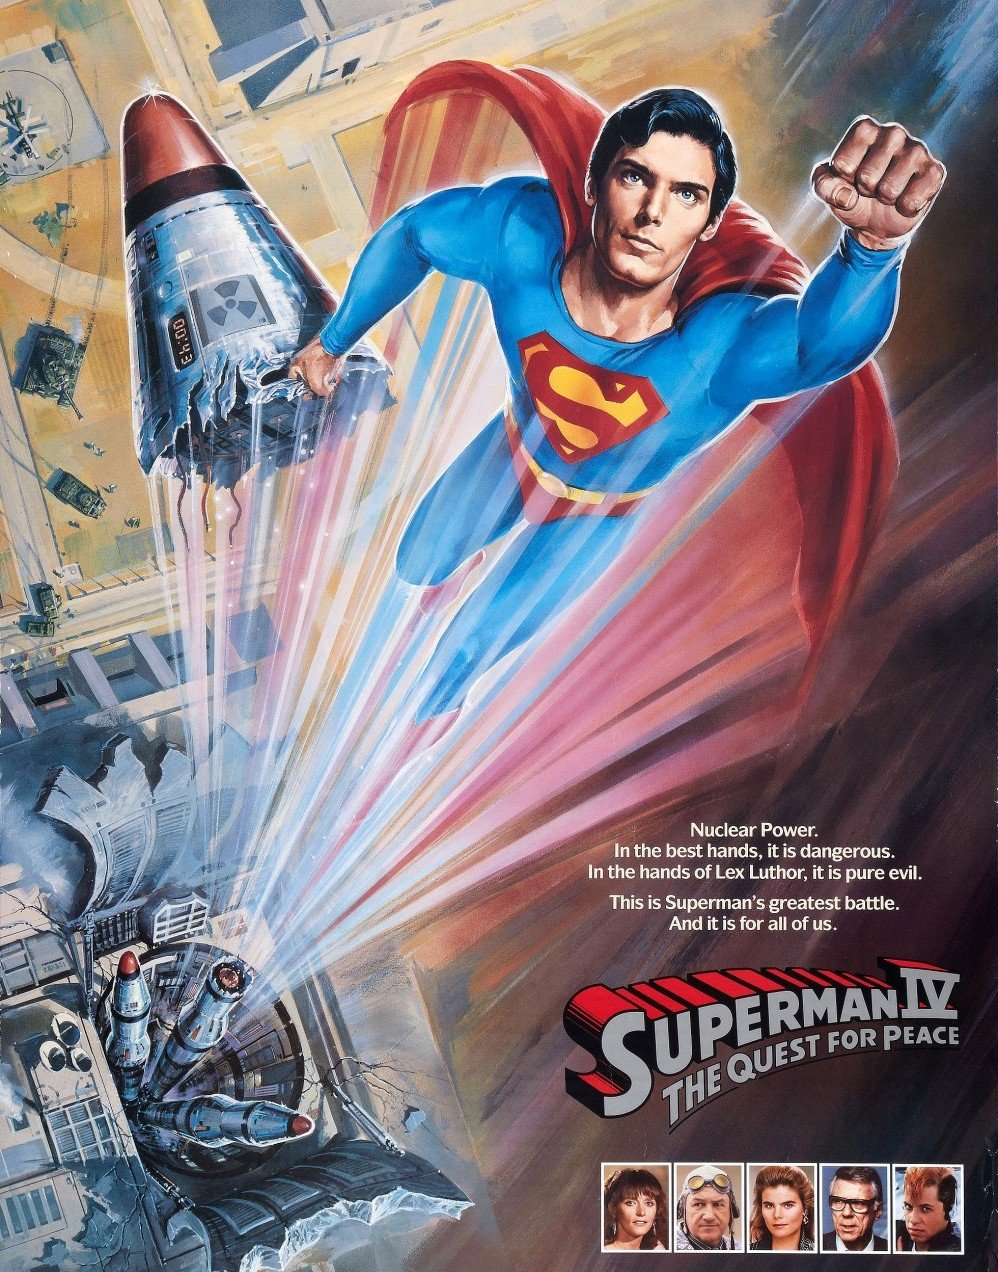 MV5BMmIwZWY1YTYtNDlhOS00NDRmLWI4MzItNjk2NDc1N2NhYzNlXkEyXkFqcGdeQXVyNTUyMzE4Mzg@. V1 24 Things You Probably Didn't Know About Christopher Reeve's Superman Films